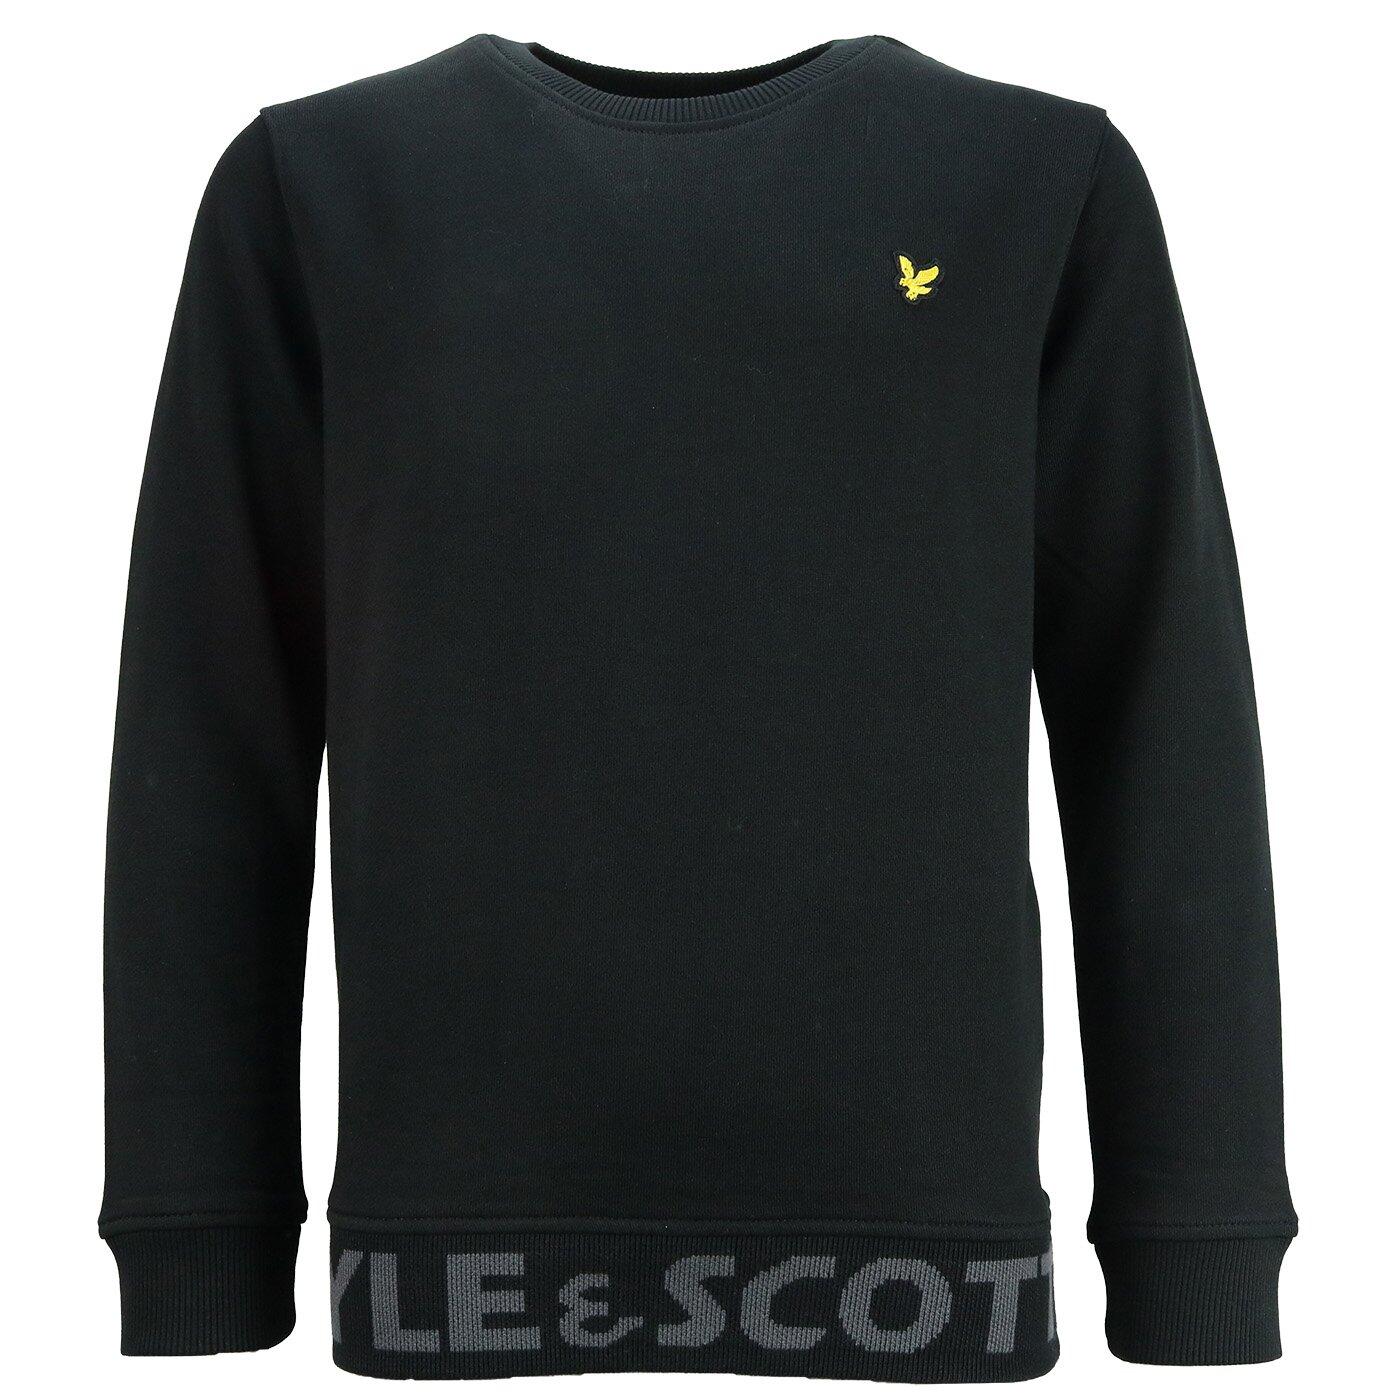 Lyle & Scott sweater Branded Black LSC0976